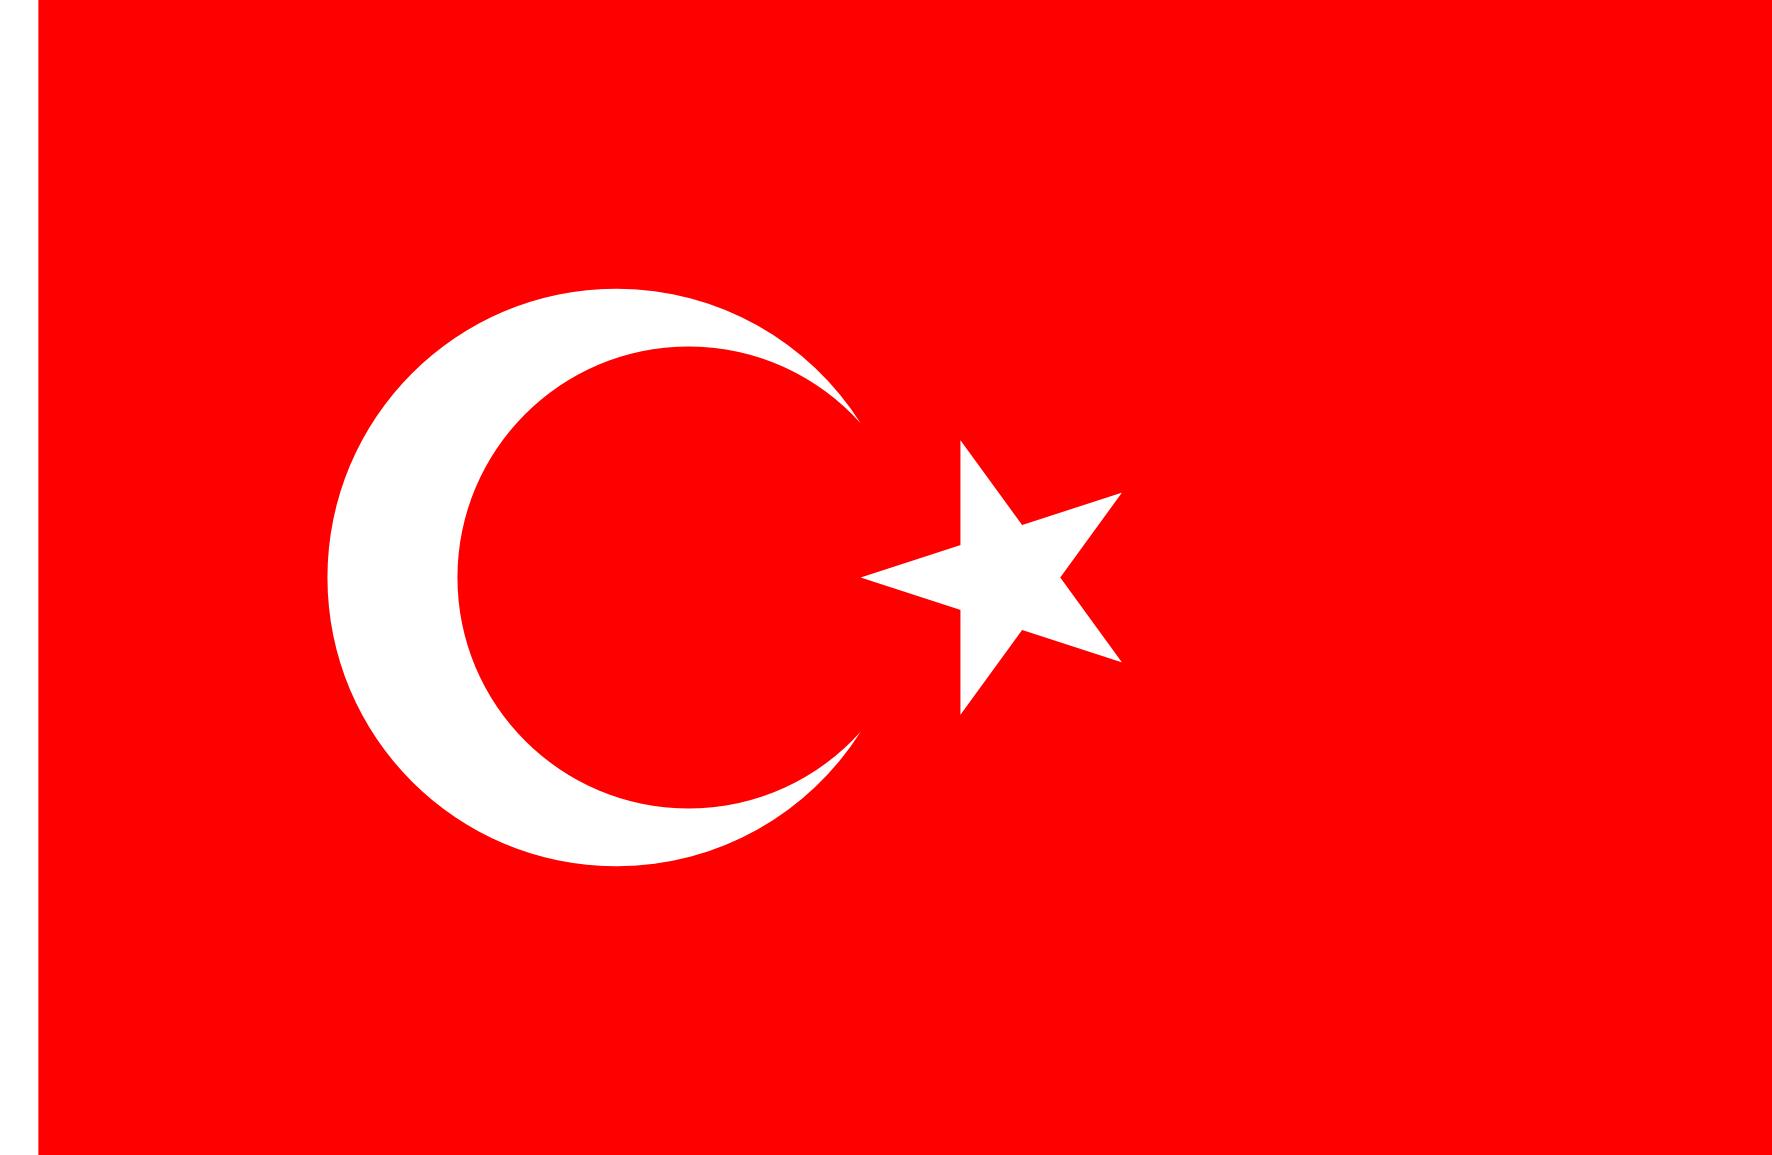 turkbayragisave21.png